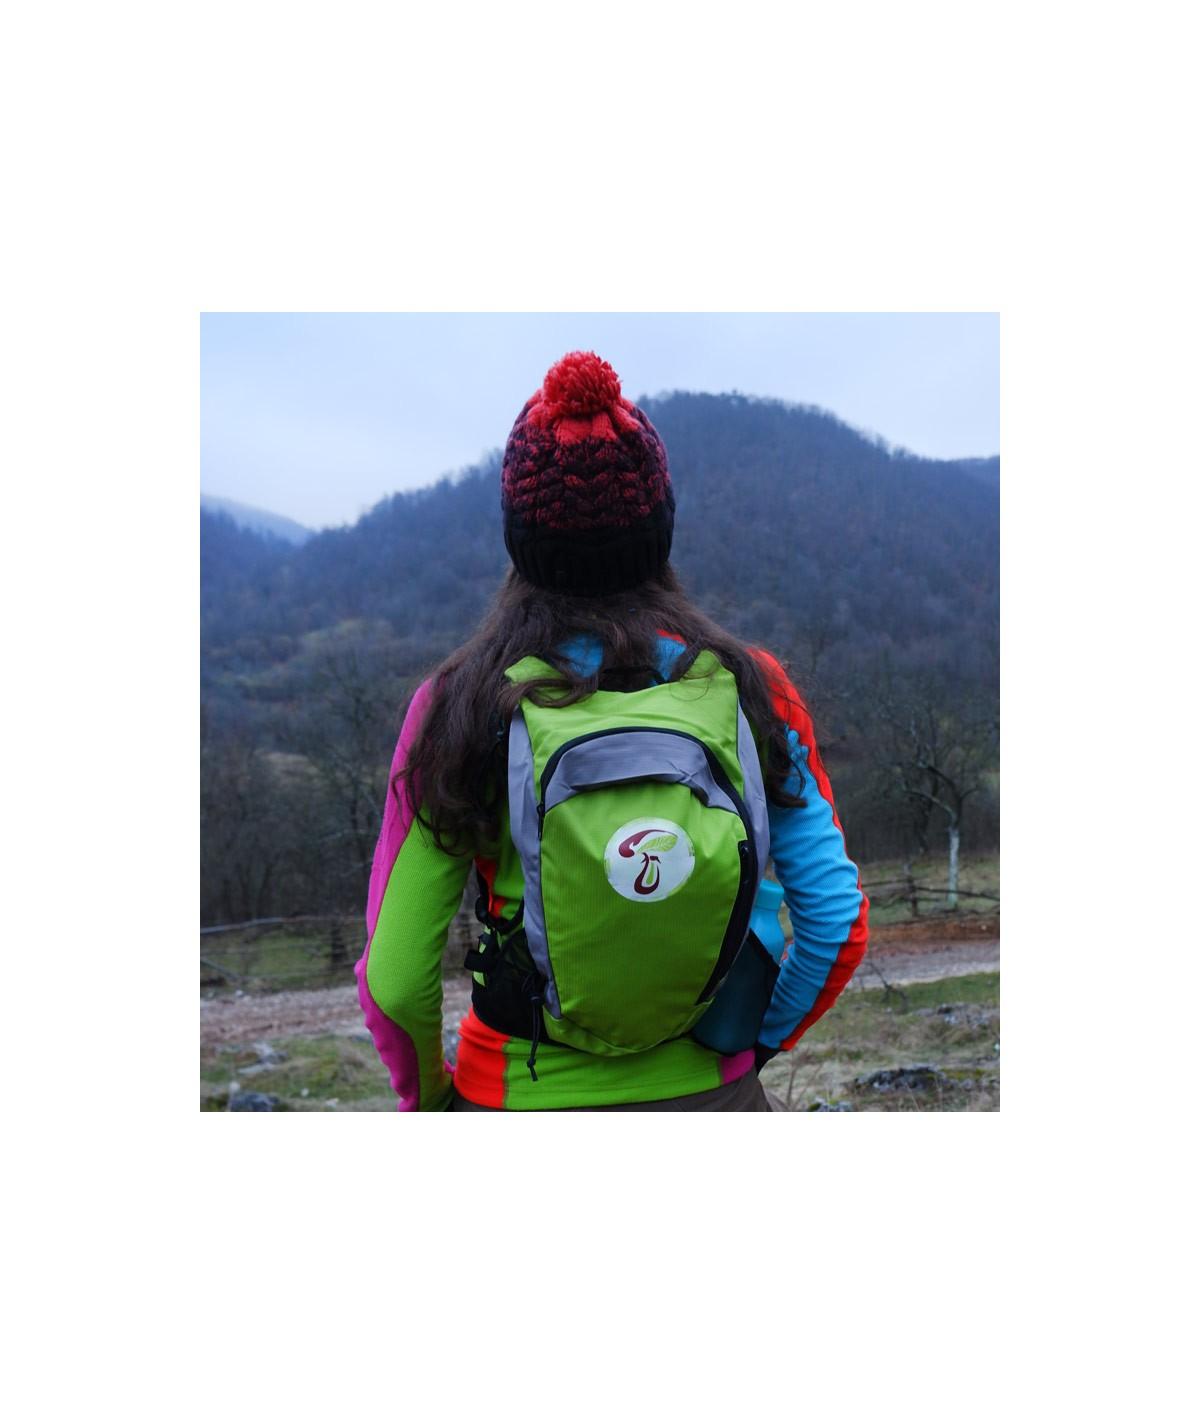 Rucsac de hiking / alergare verde cu sigla IncrEdible